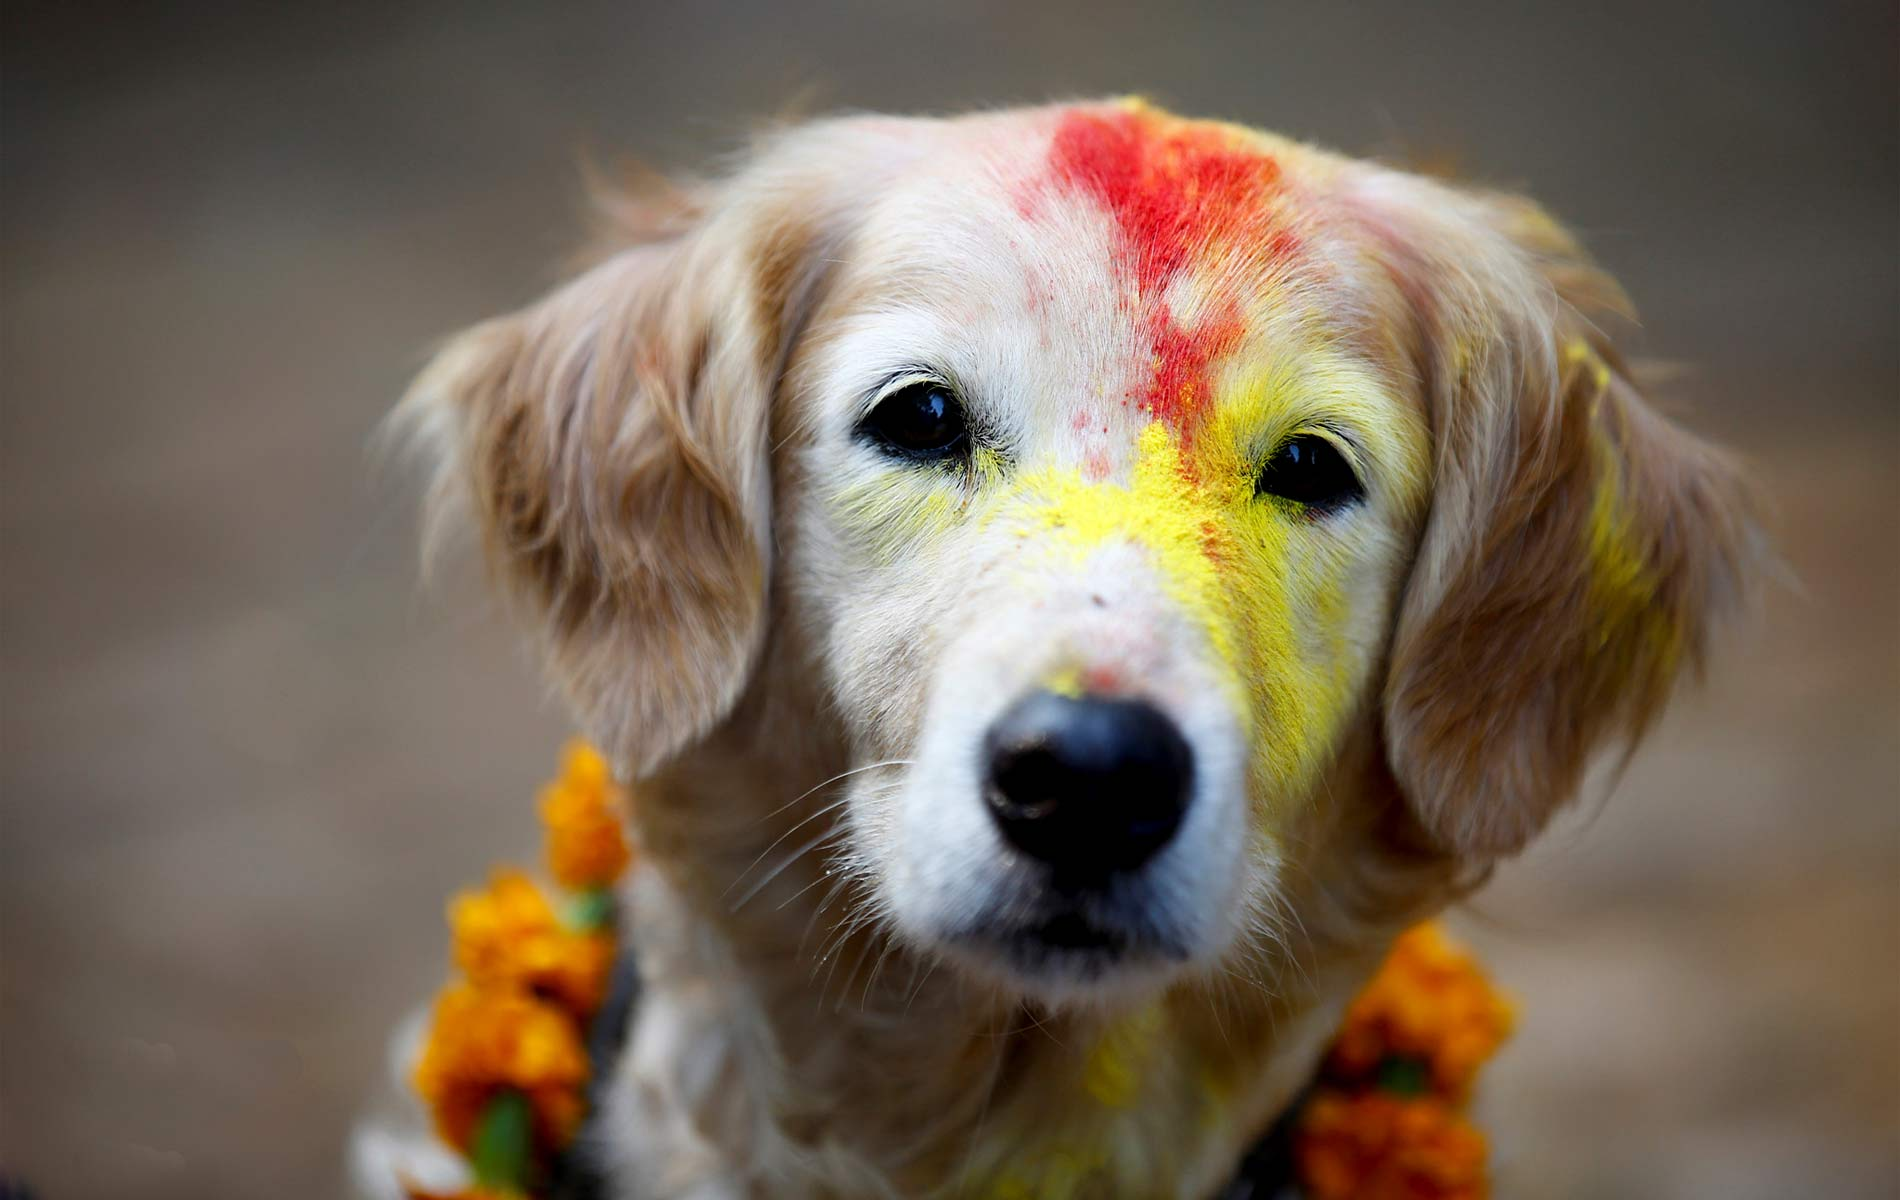 Dog worshiped on the day of Kukur tihar